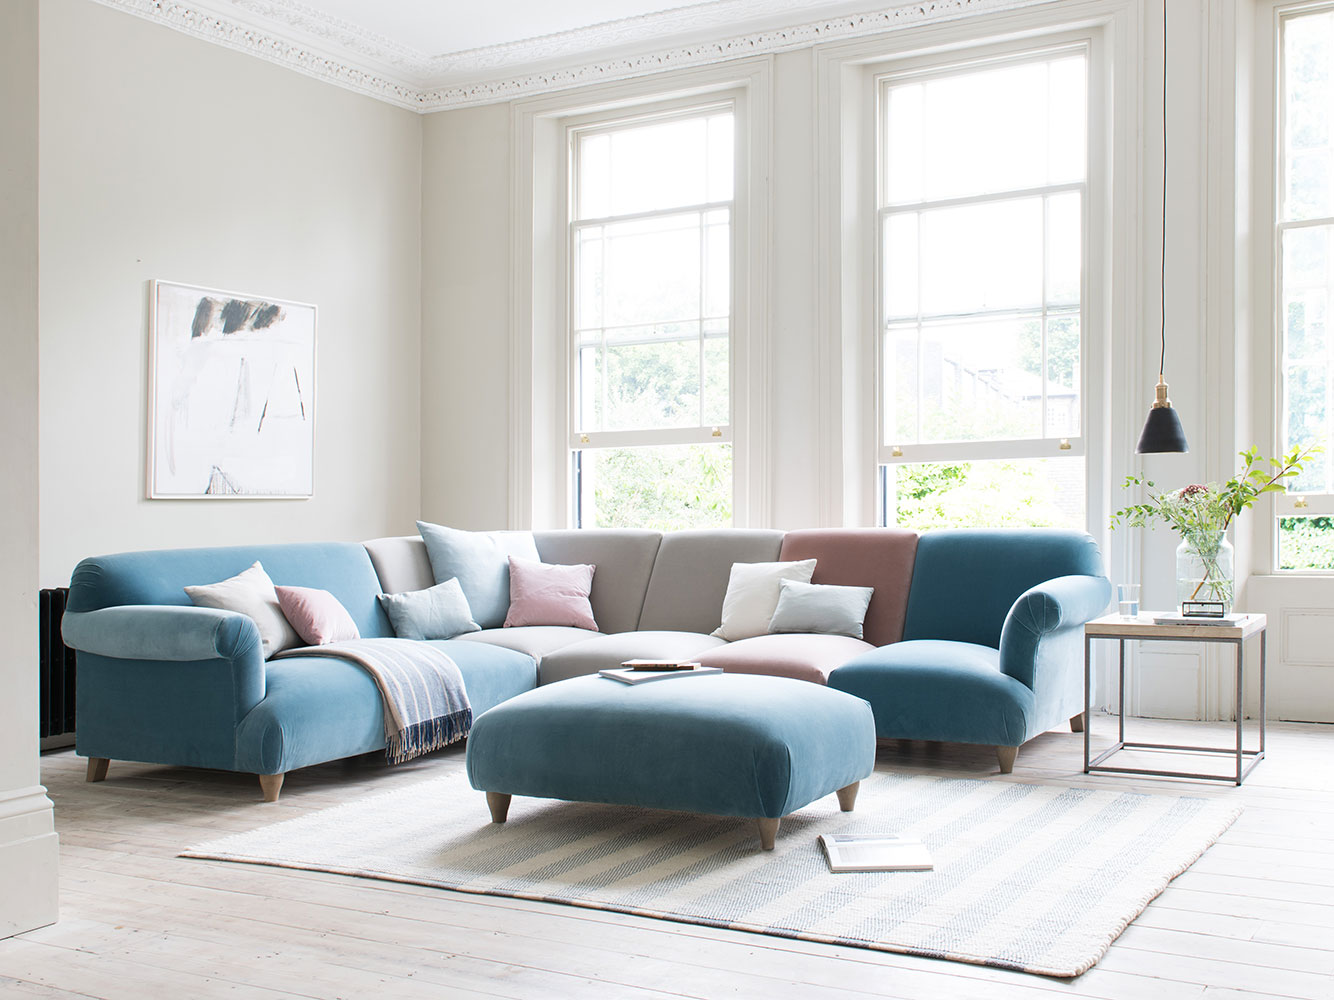 Soufflé Modular Corner Sofa